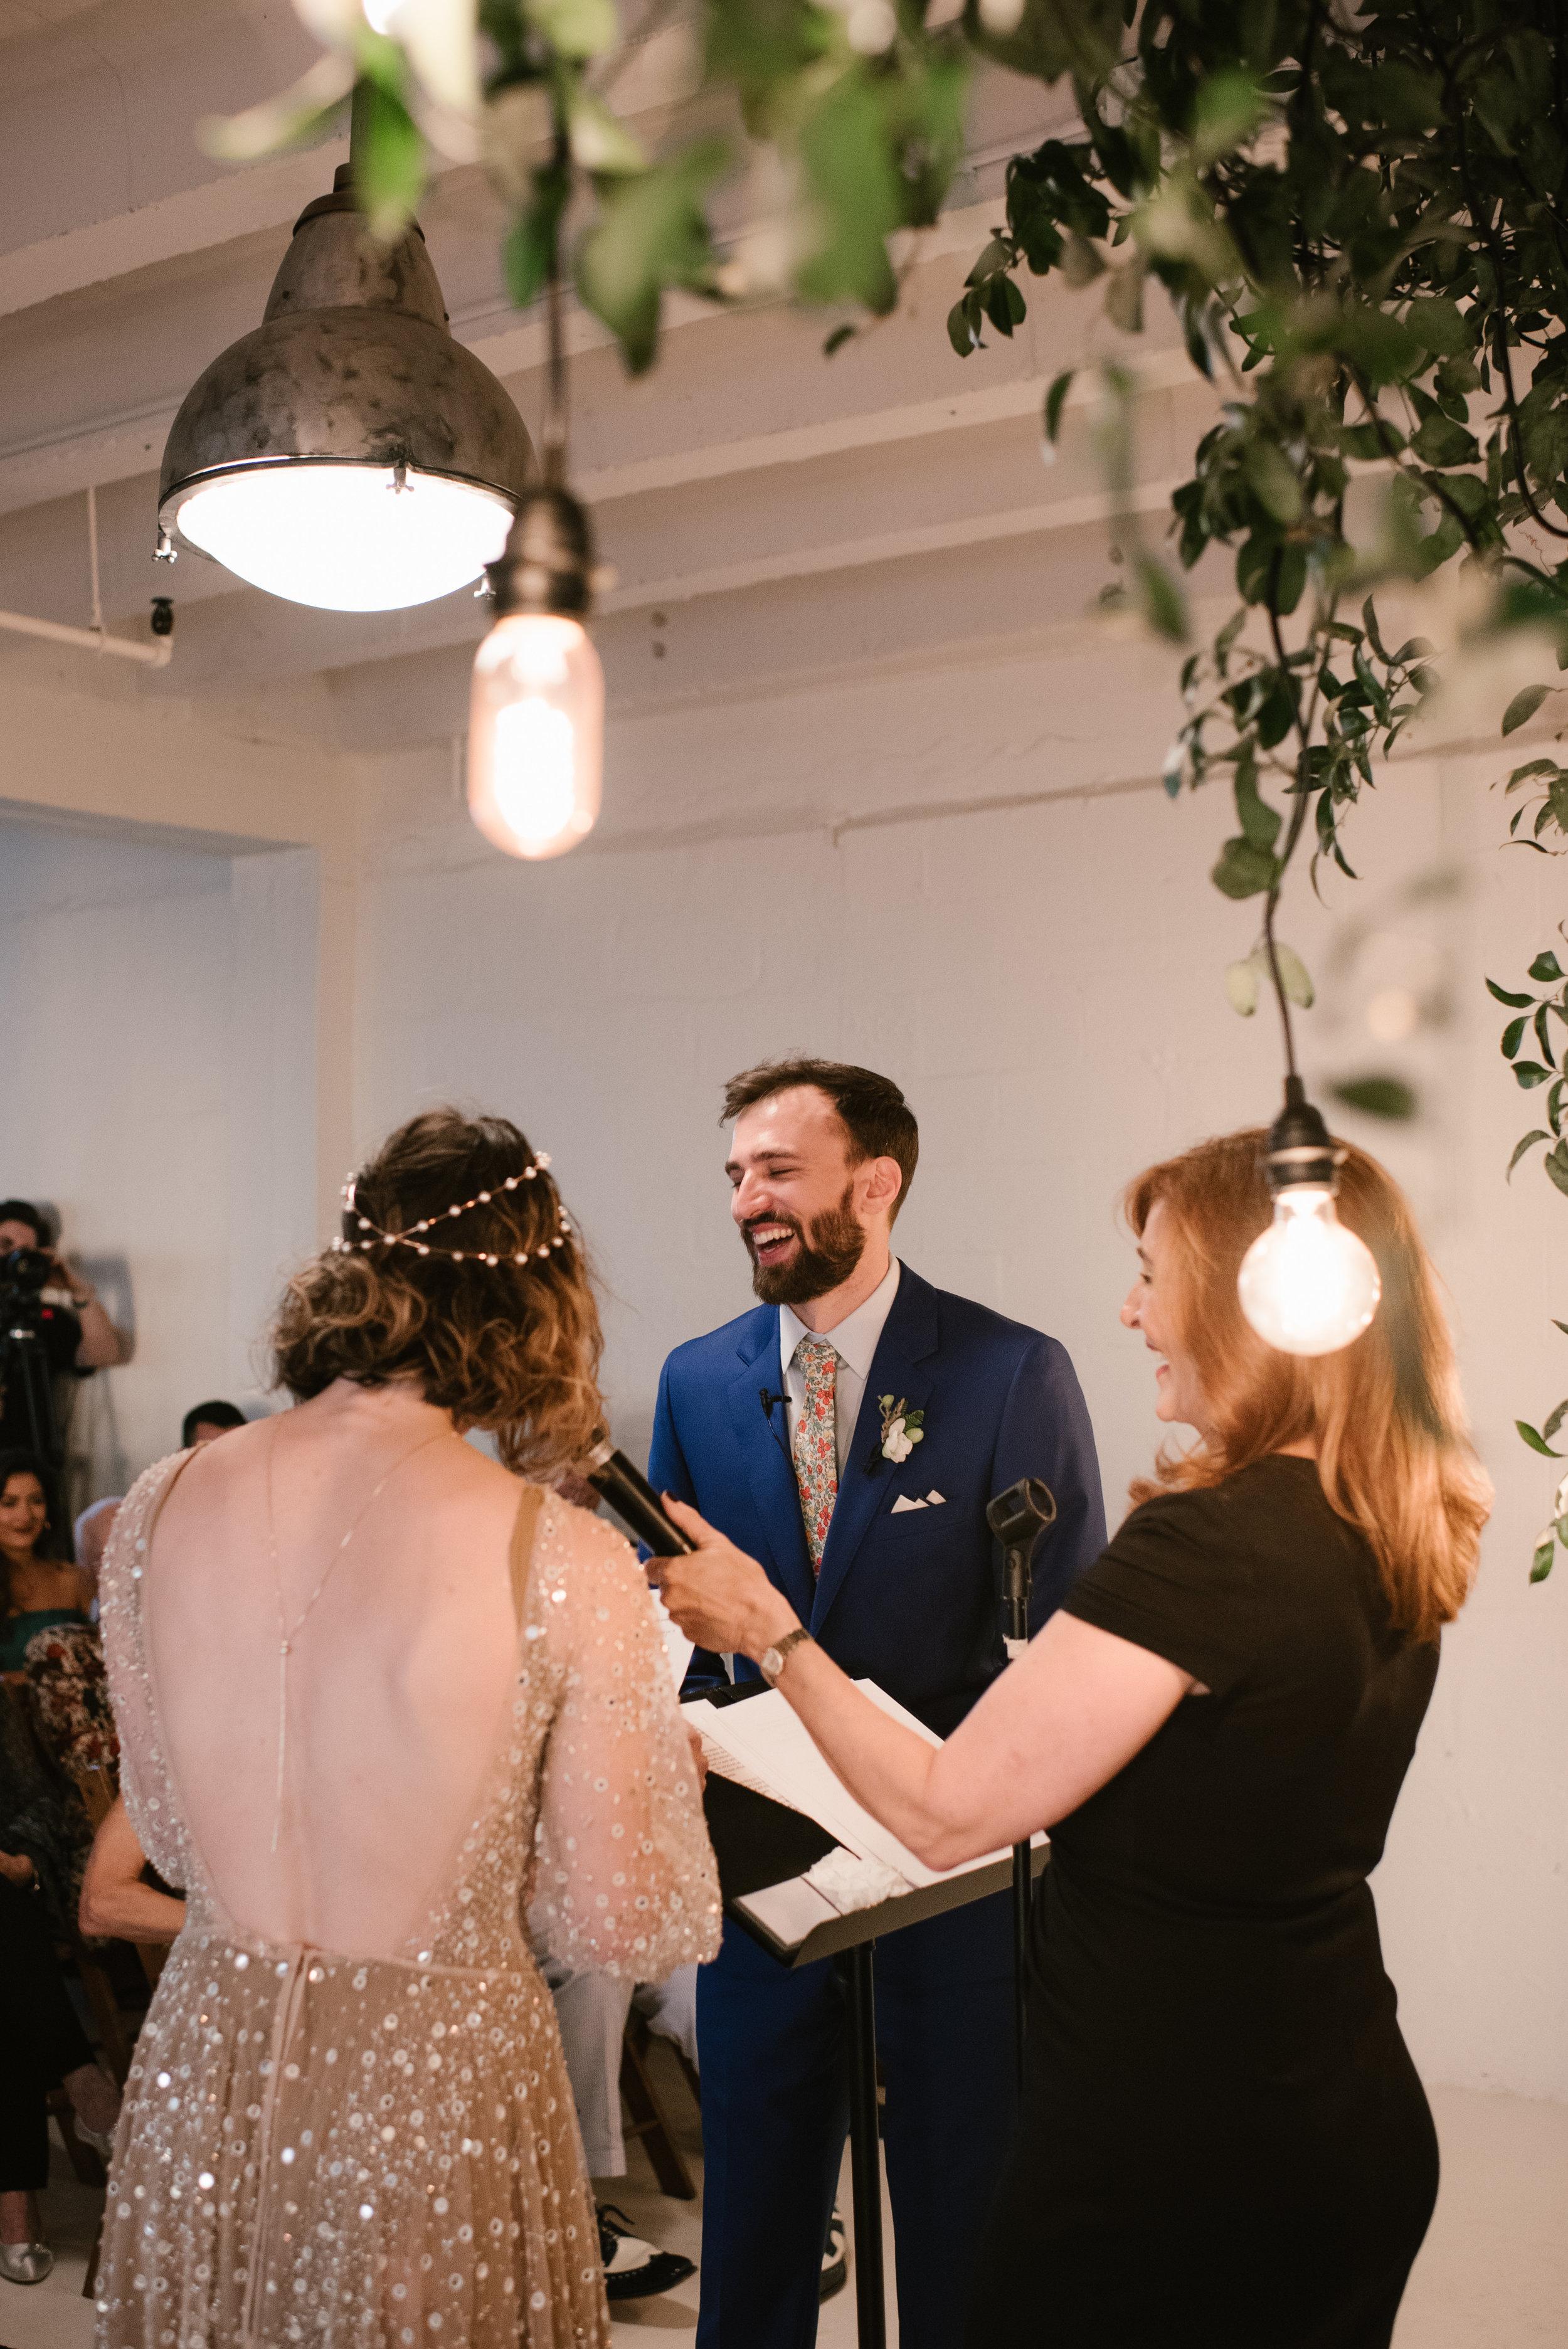 stephanie-bobby-ace-prop-house-miami-florida-wedding-889.jpg